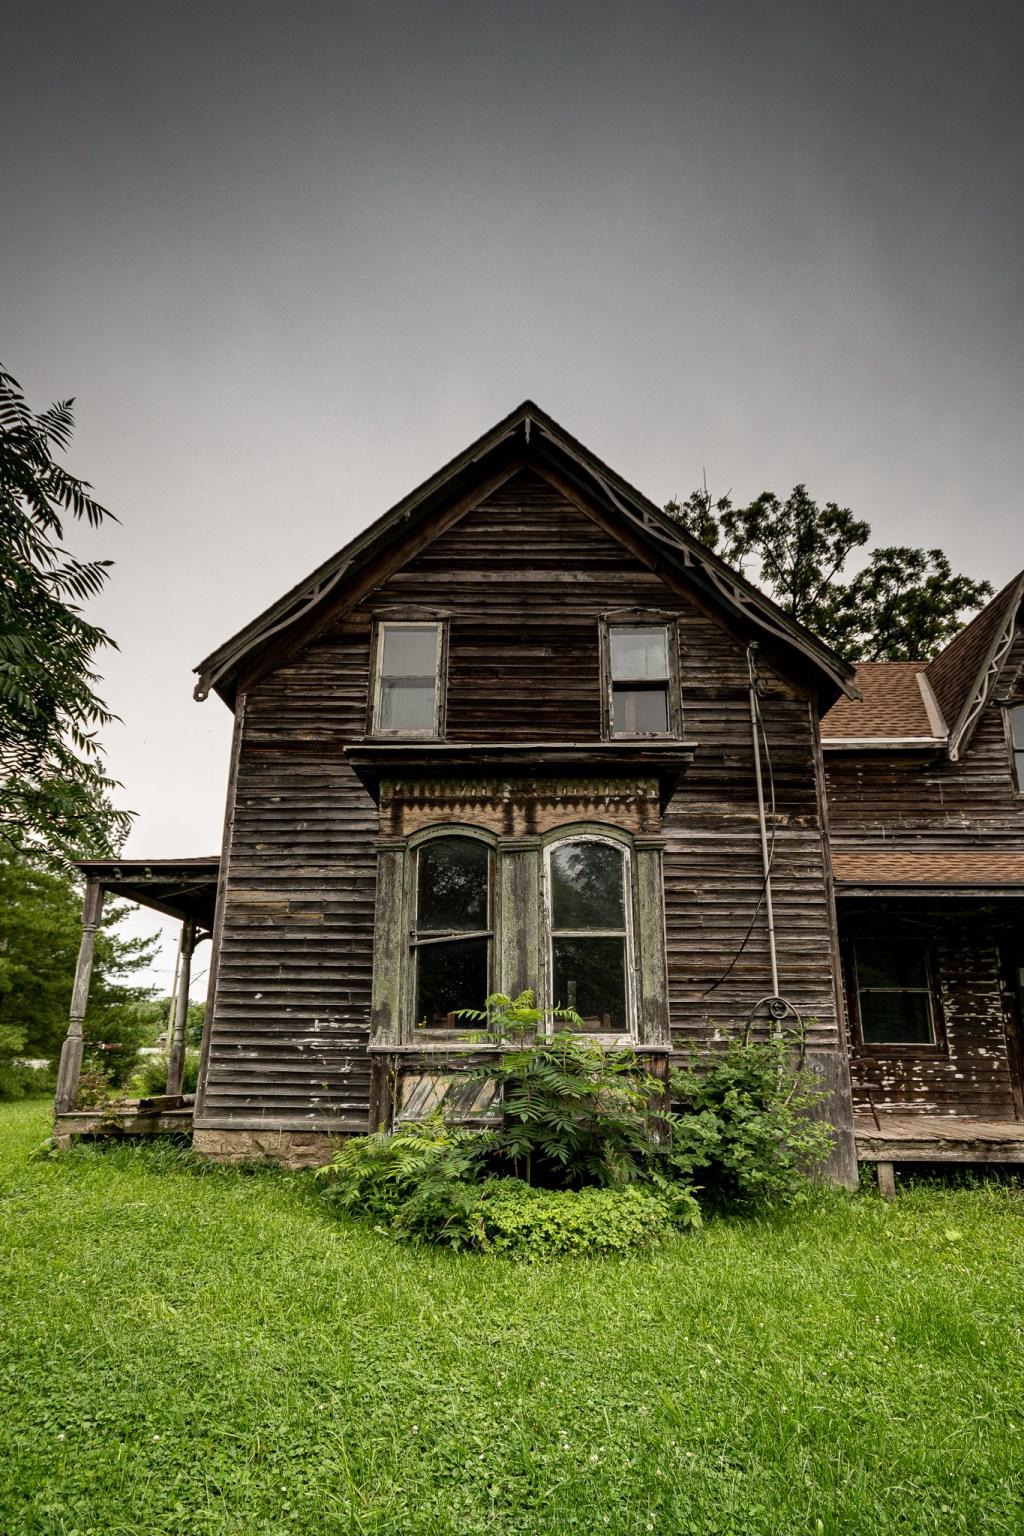 Creepy Haunted Looking Abandoned Century House